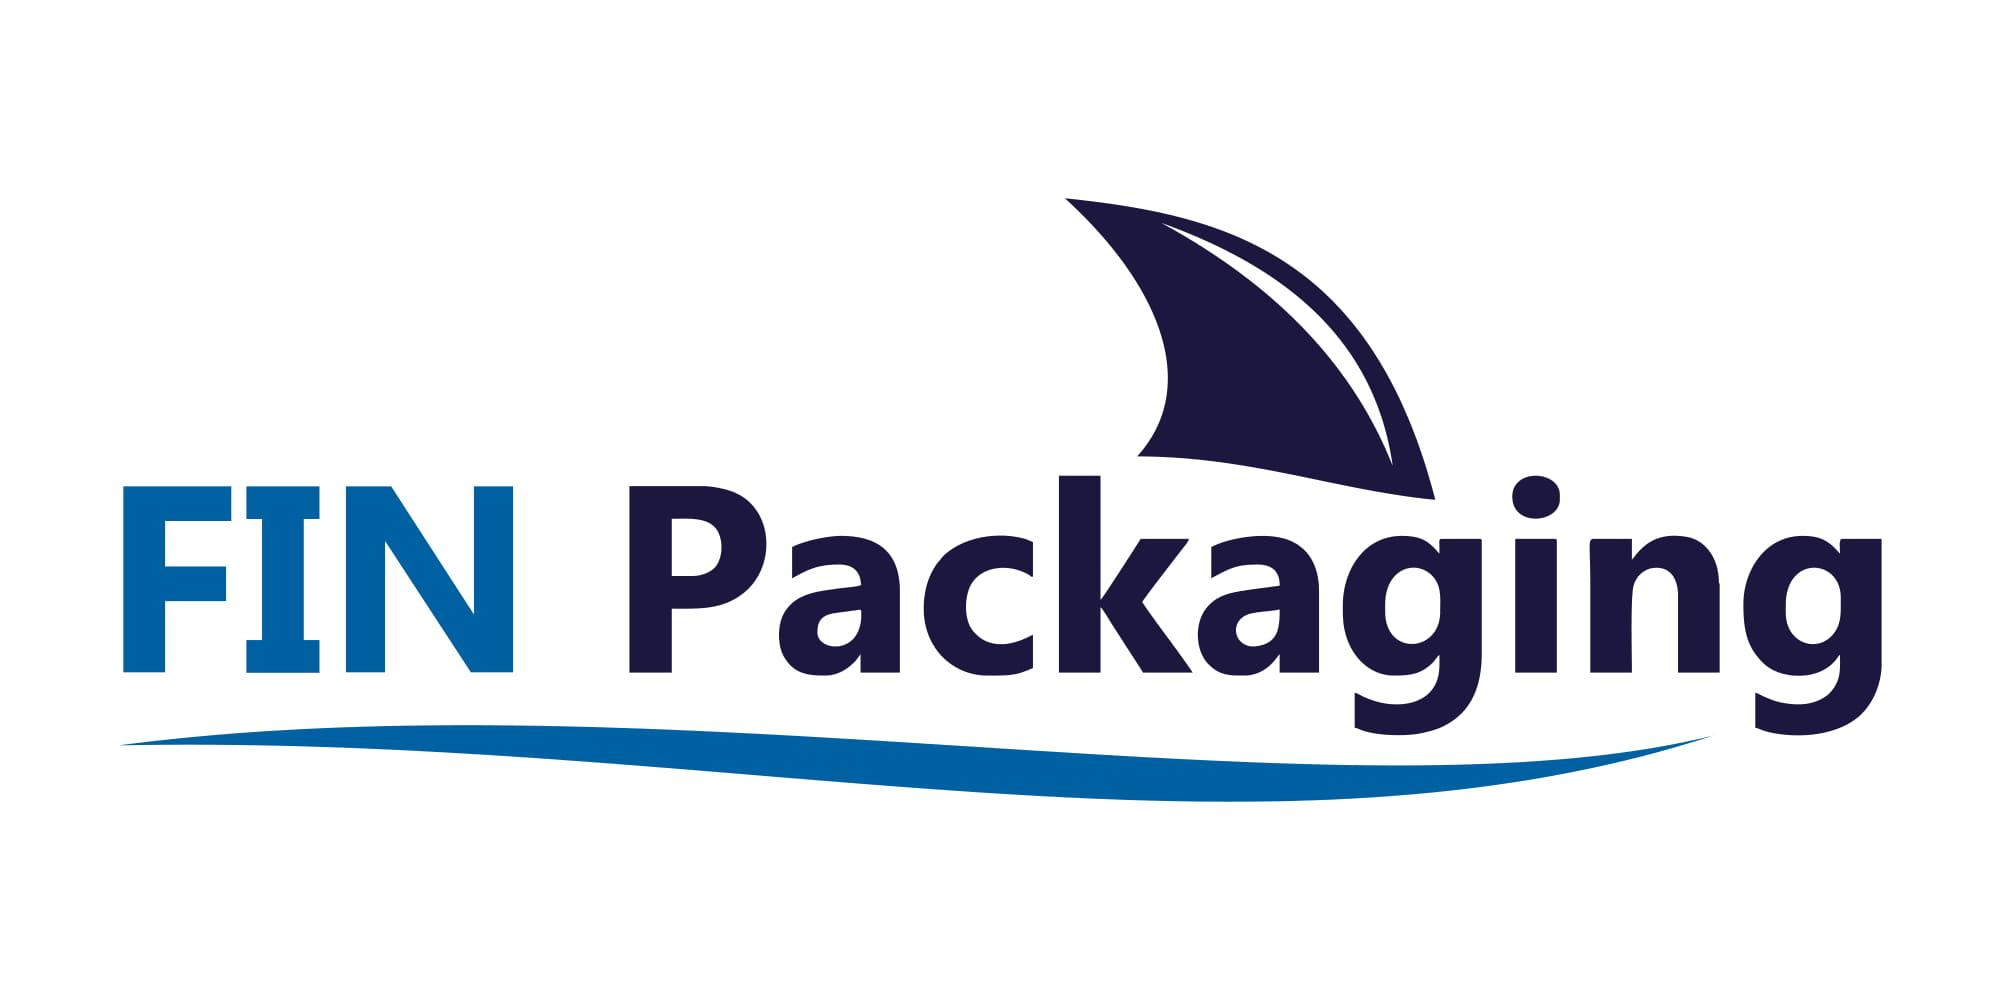 Fin Packaging